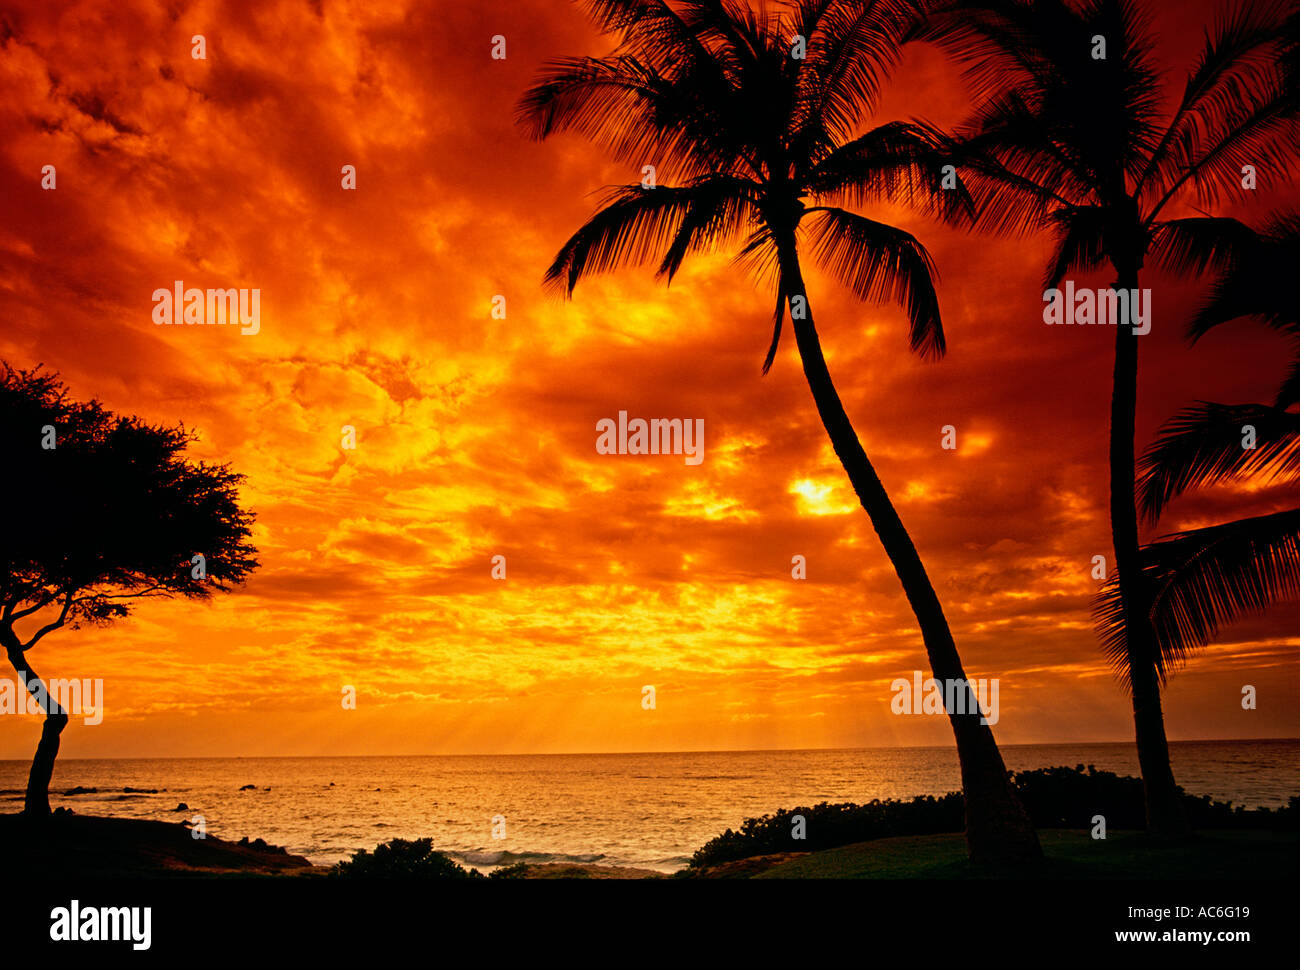 palm tree, palm trees, sunset, Ulua Beach, town of Wailea, Maui, Maui Island, Hawaii, United States Stock Photo